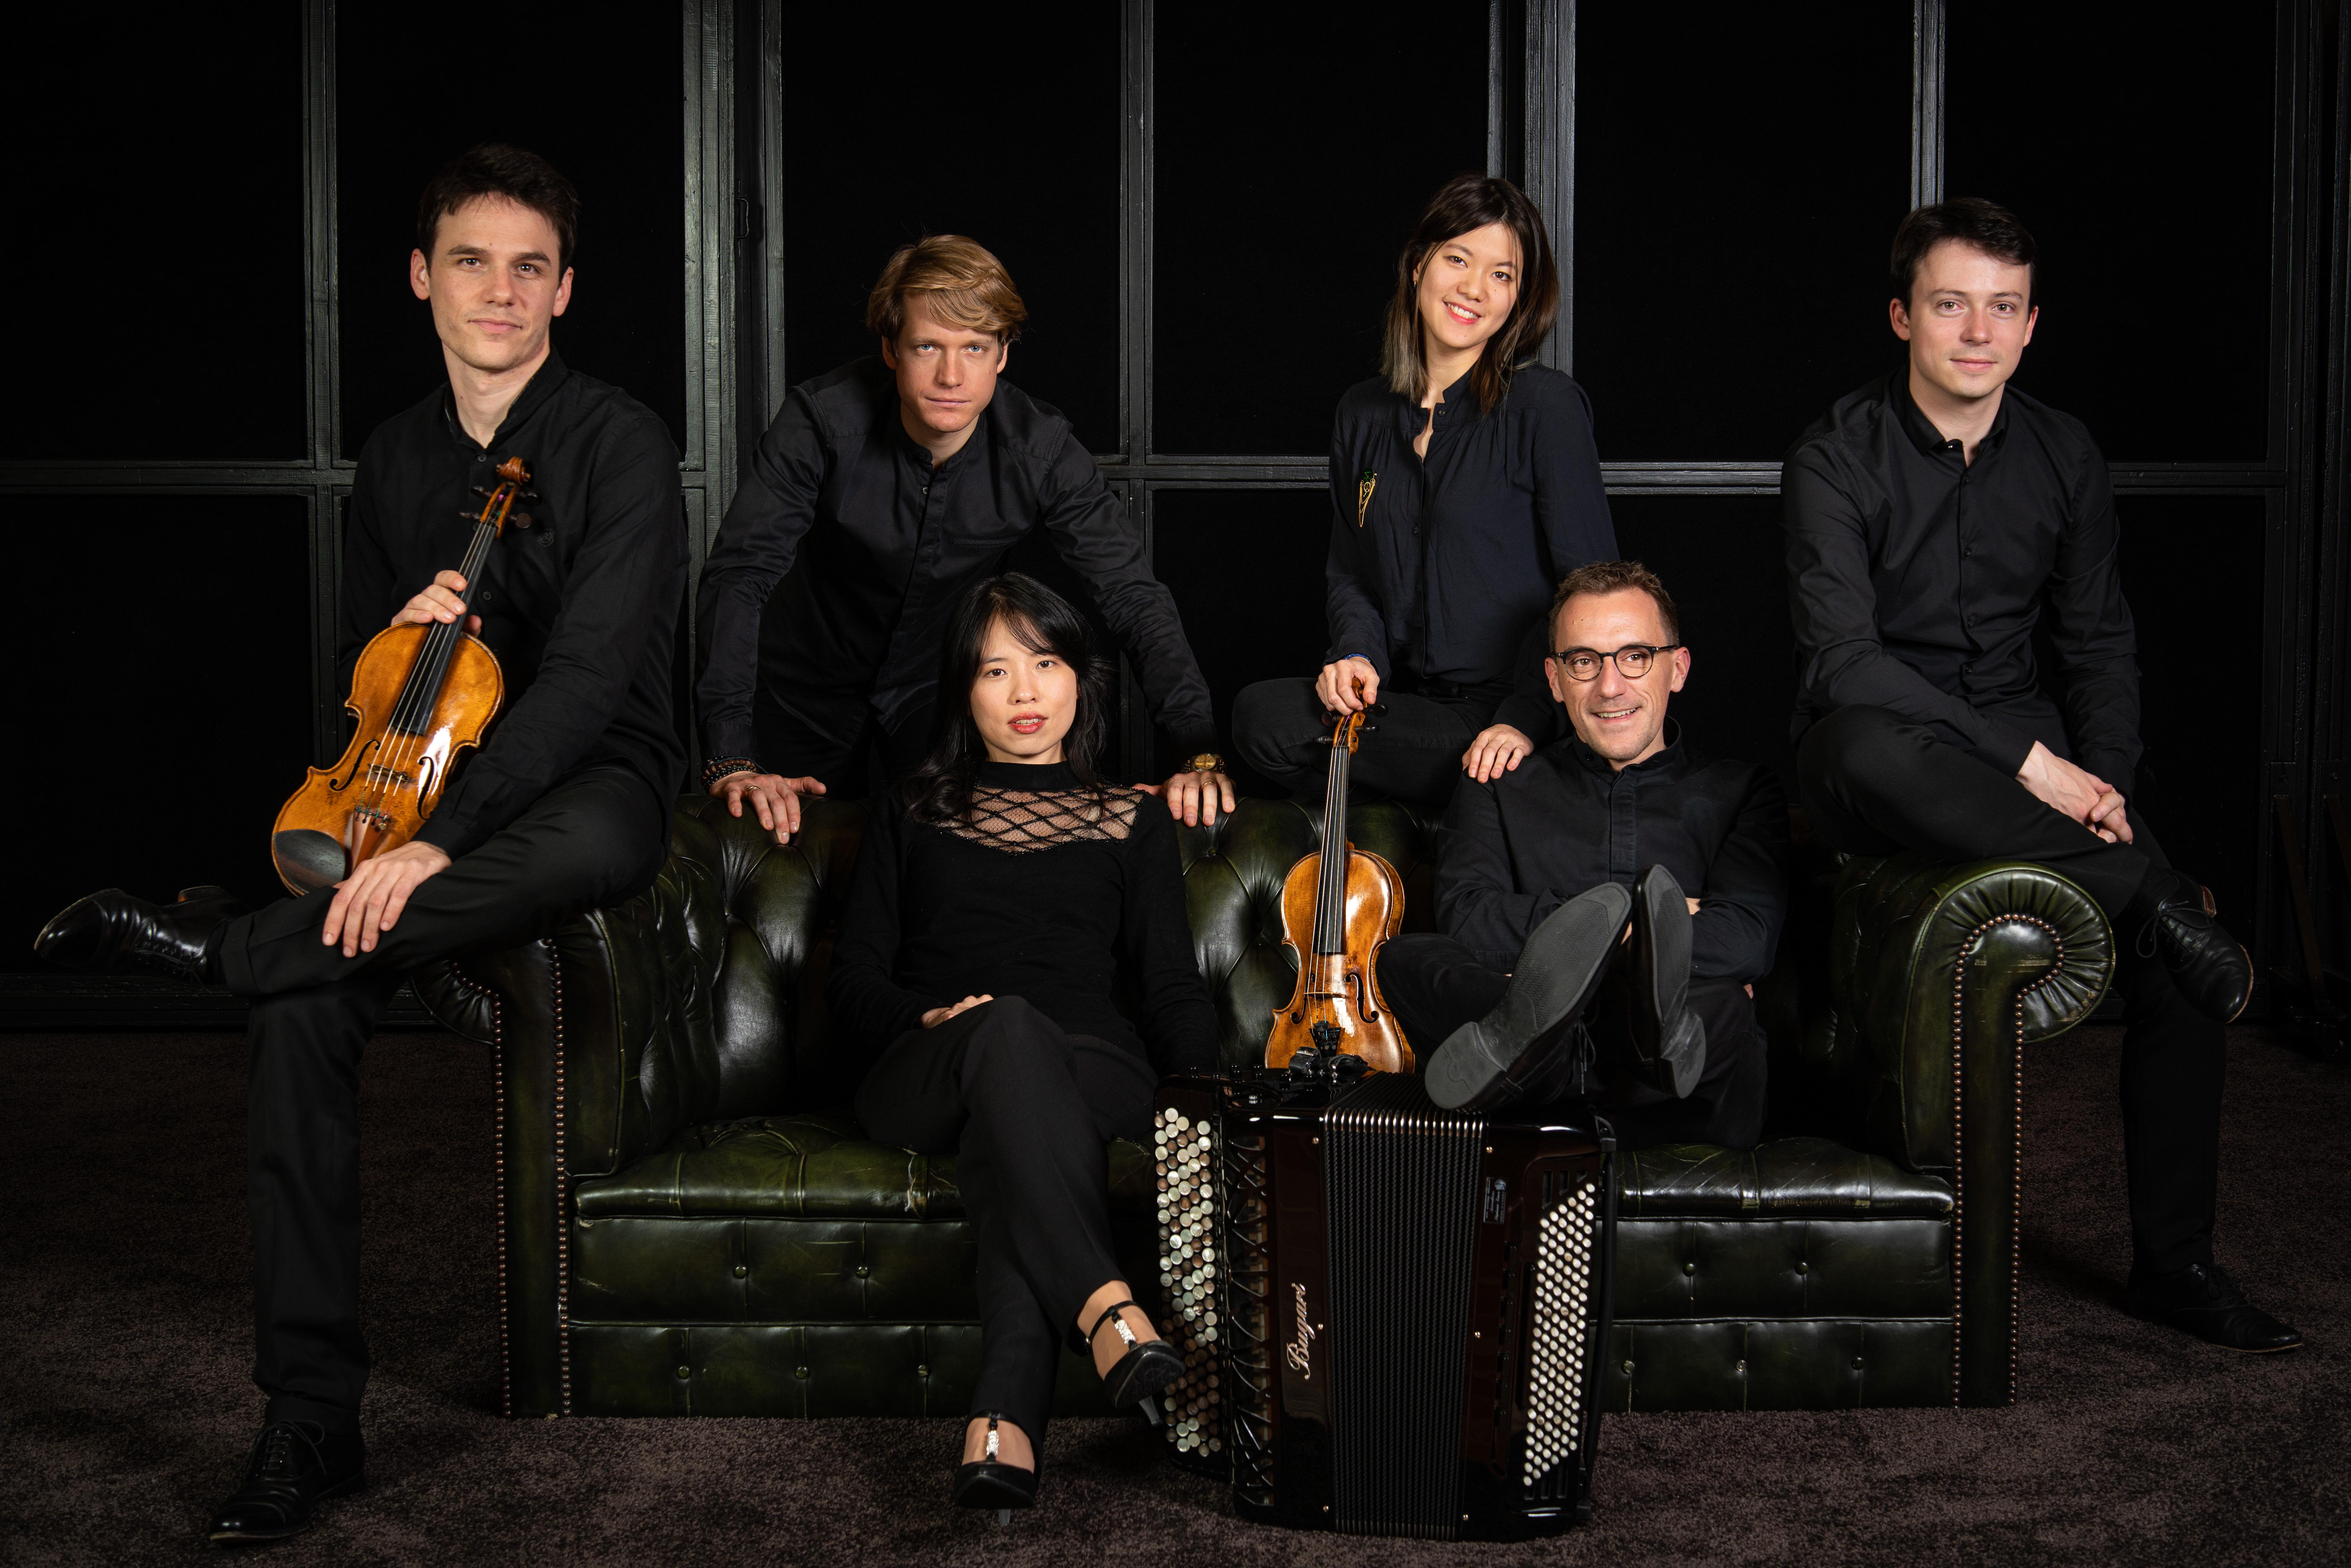 Félicien Brut & le Quatuor Hermès